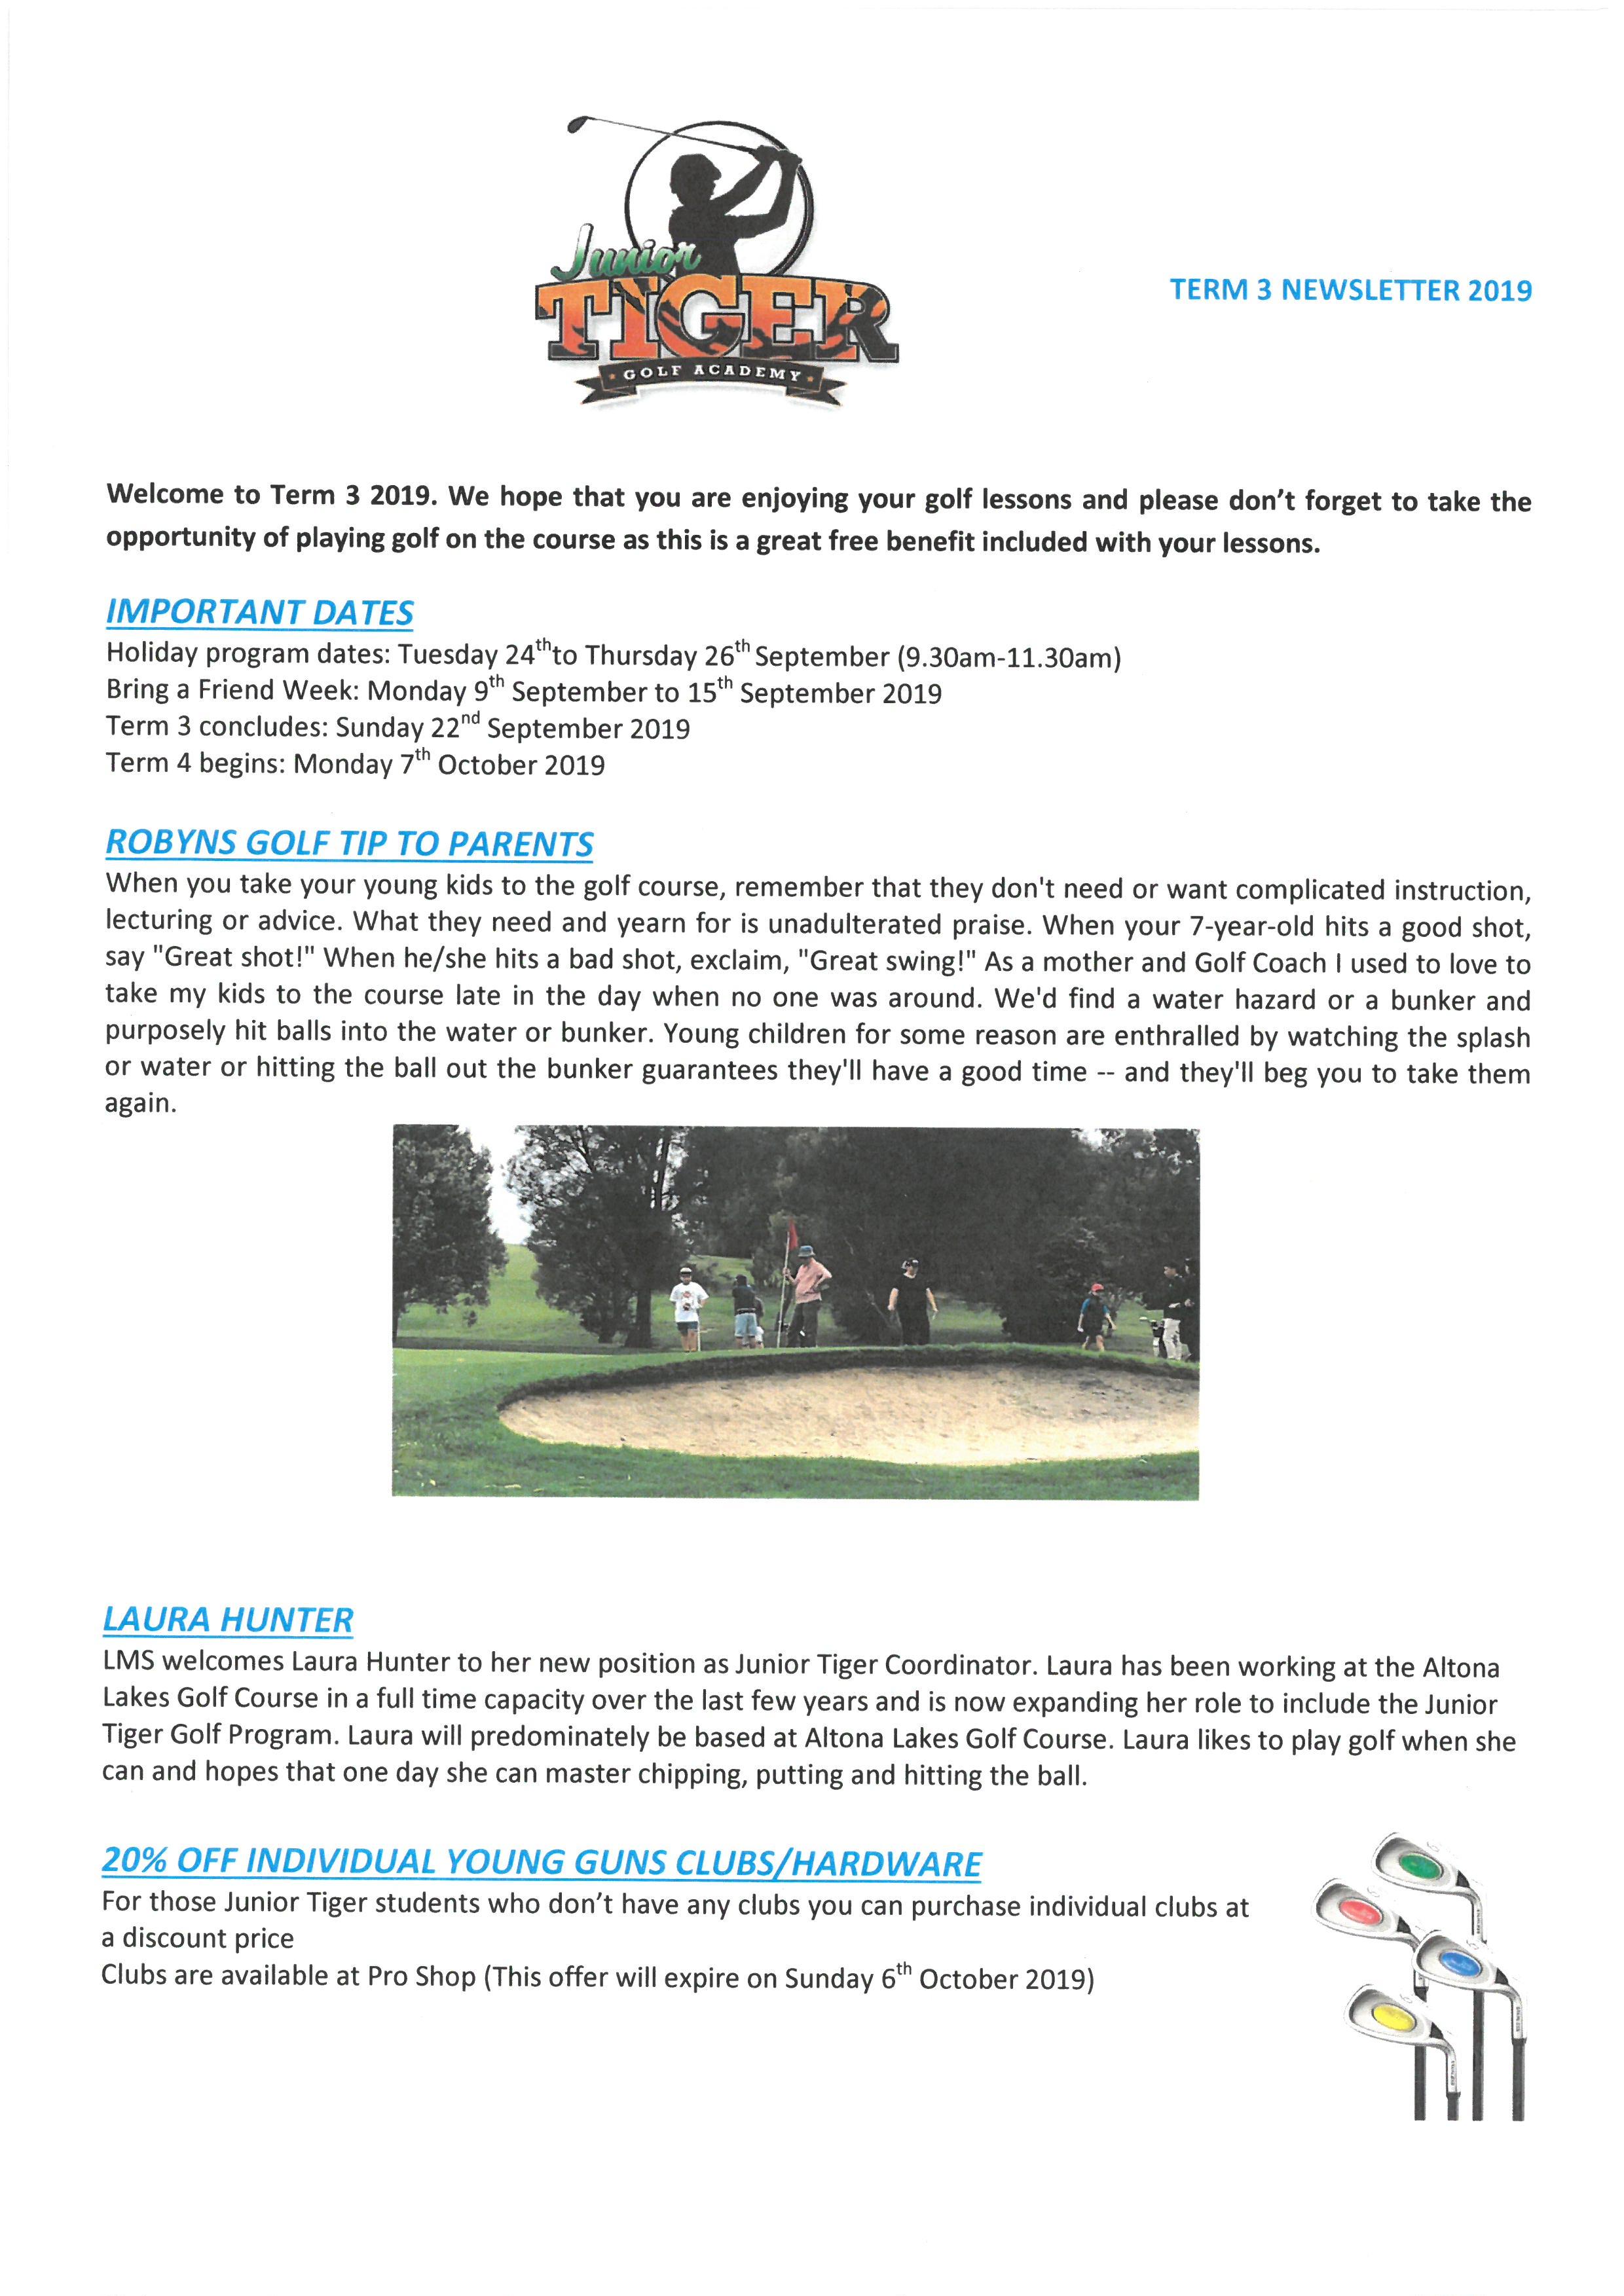 Ivanhoe Golf Course – Junior Tiger Newsletter Term 3 2019